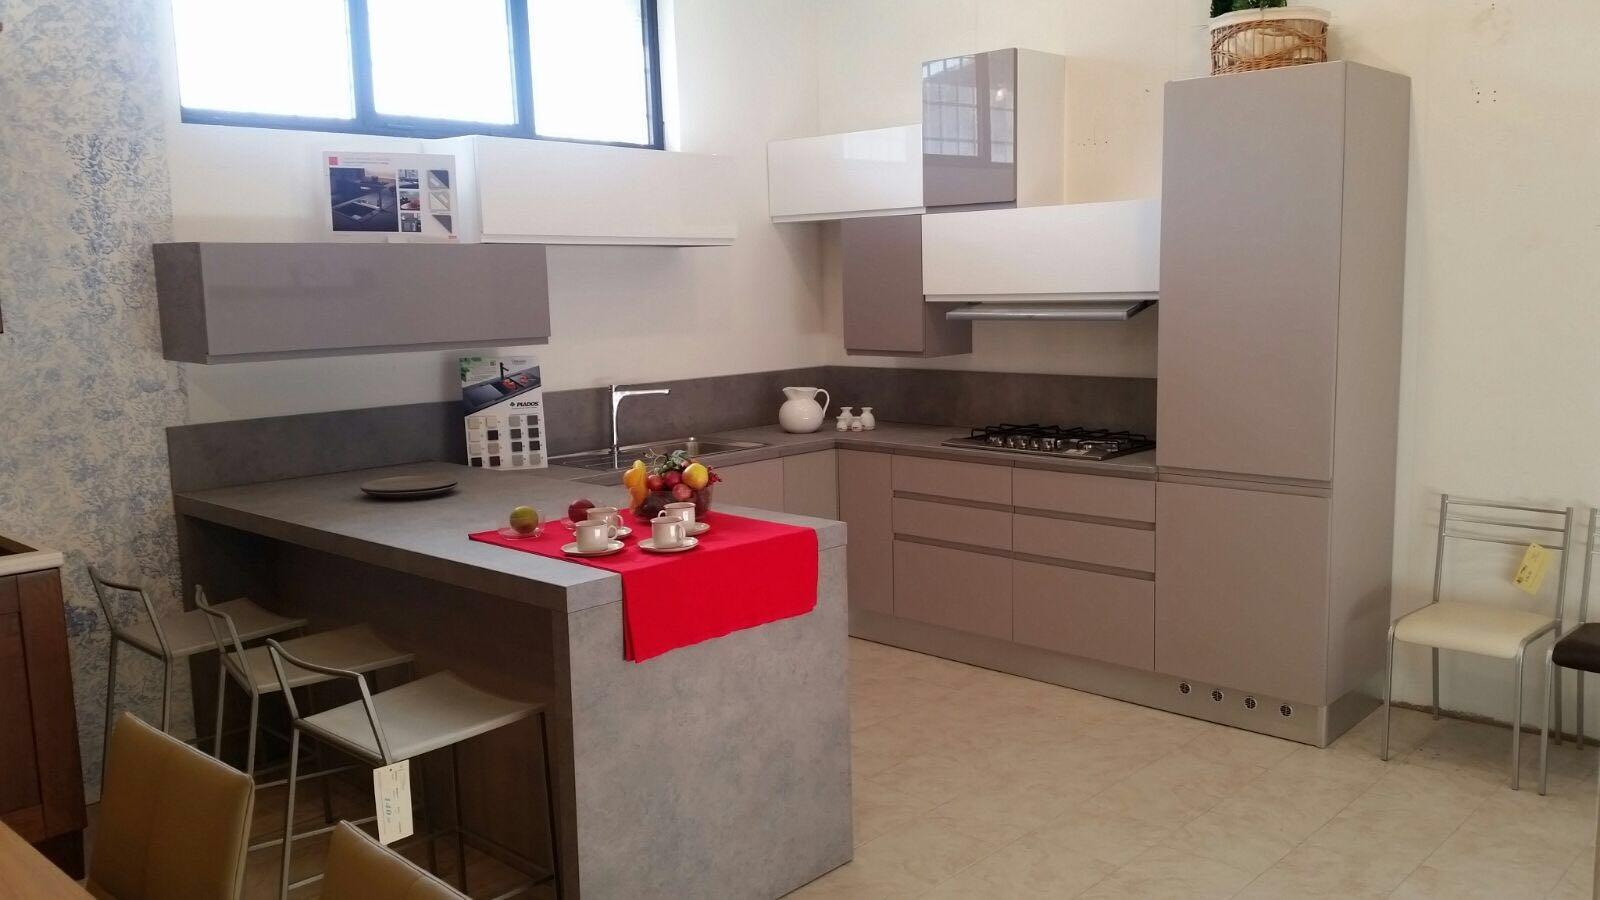 Cucine bianco e tortora la scelta giusta variata sul - Cucina bianca e tortora ...